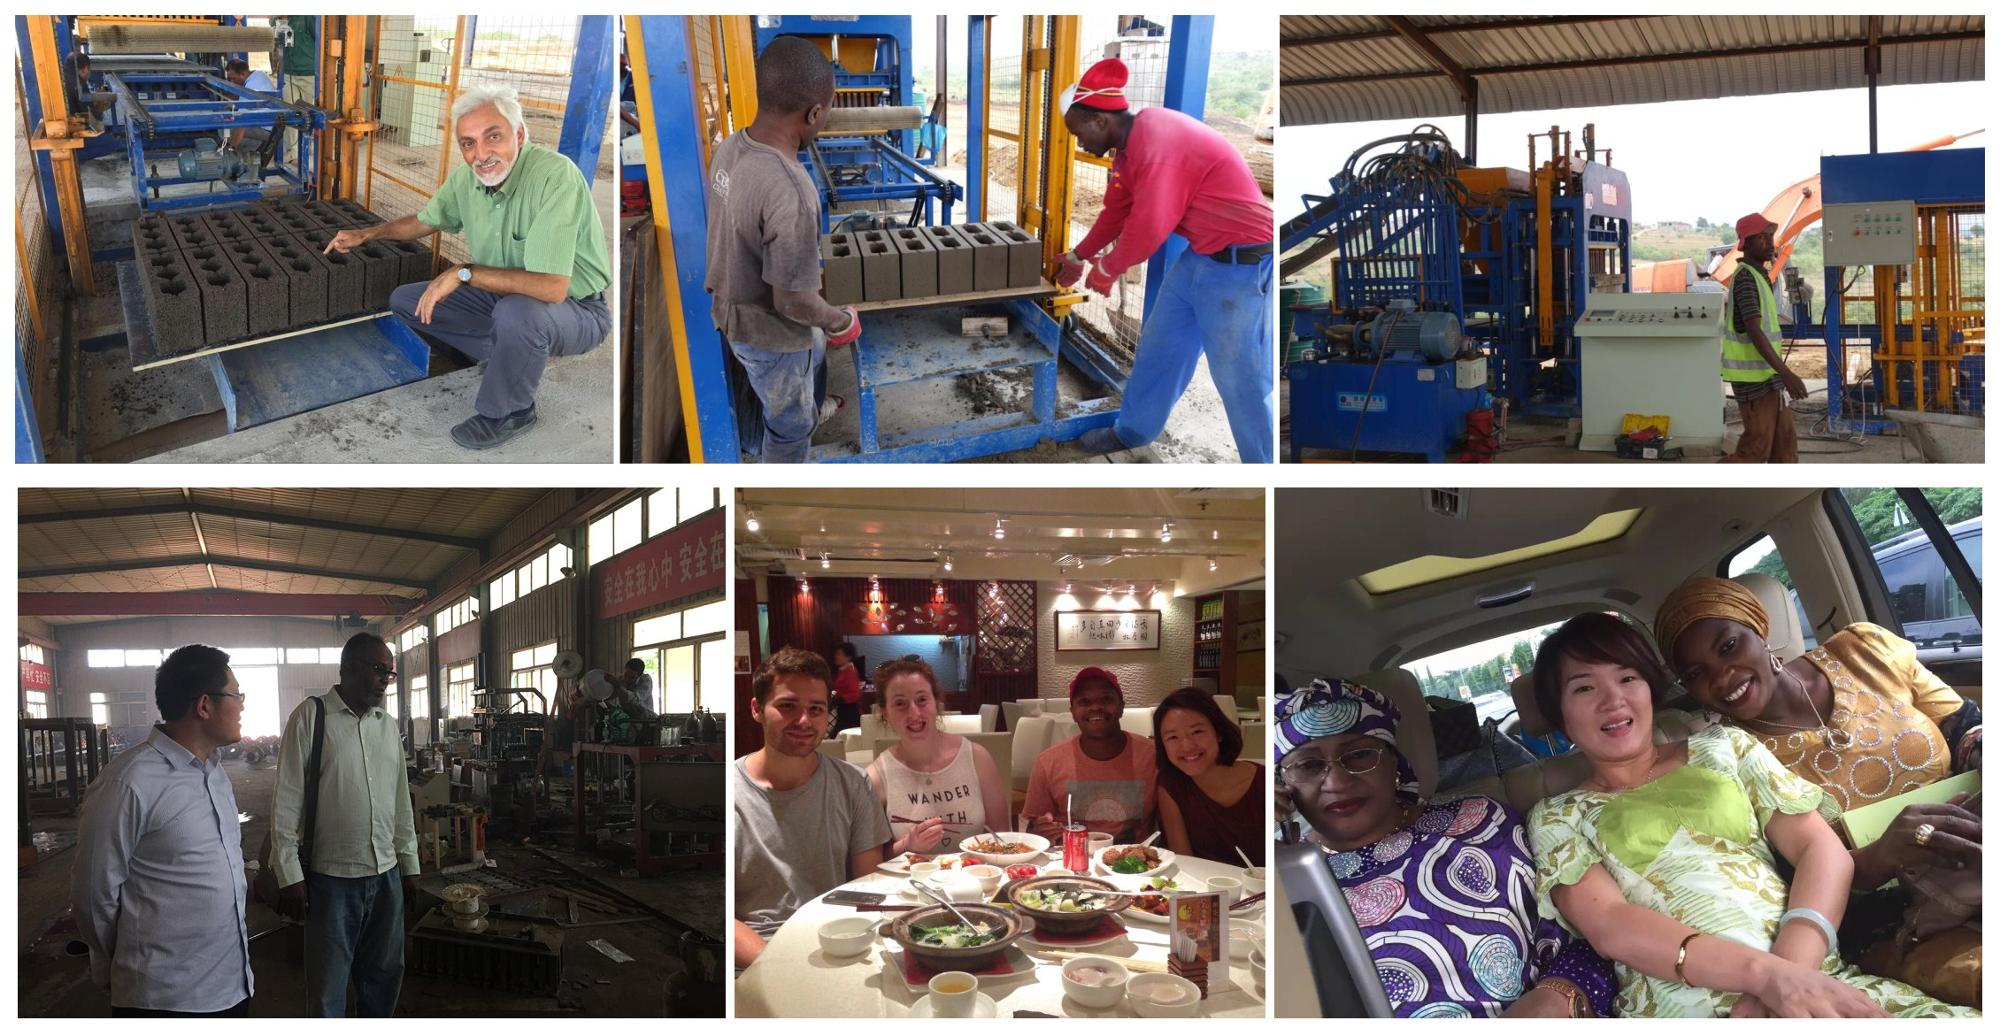 qmr2-40 movable manual clay interlocking brick make machinery lego block making machine